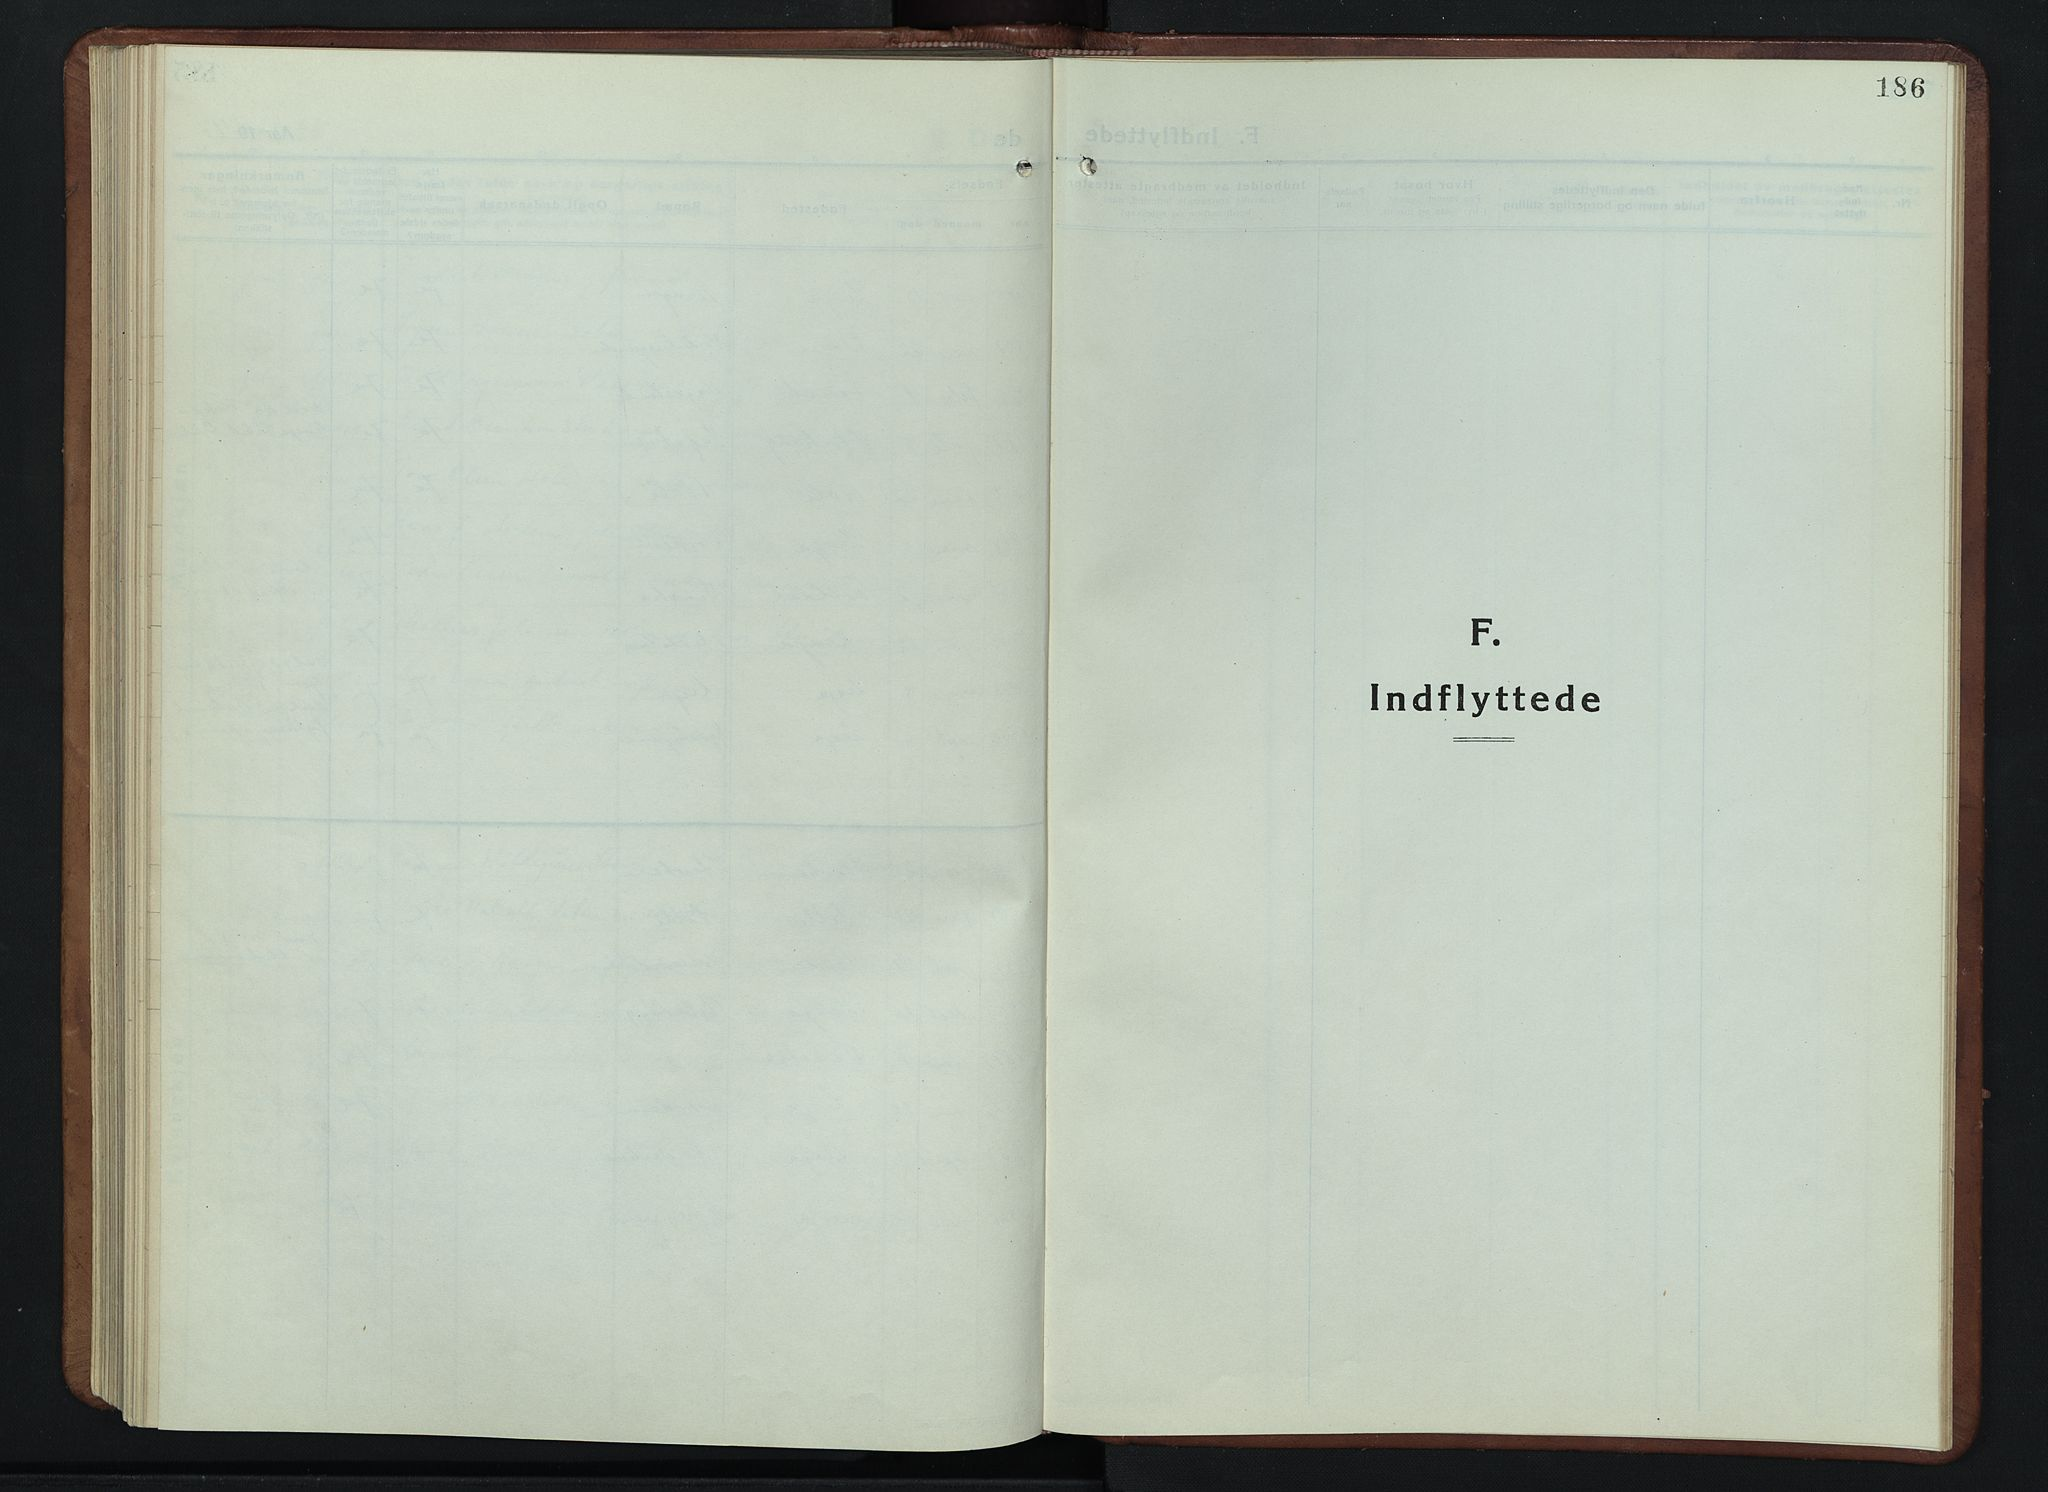 SAH, Lesja prestekontor, Klokkerbok nr. 9, 1924-1947, s. 186